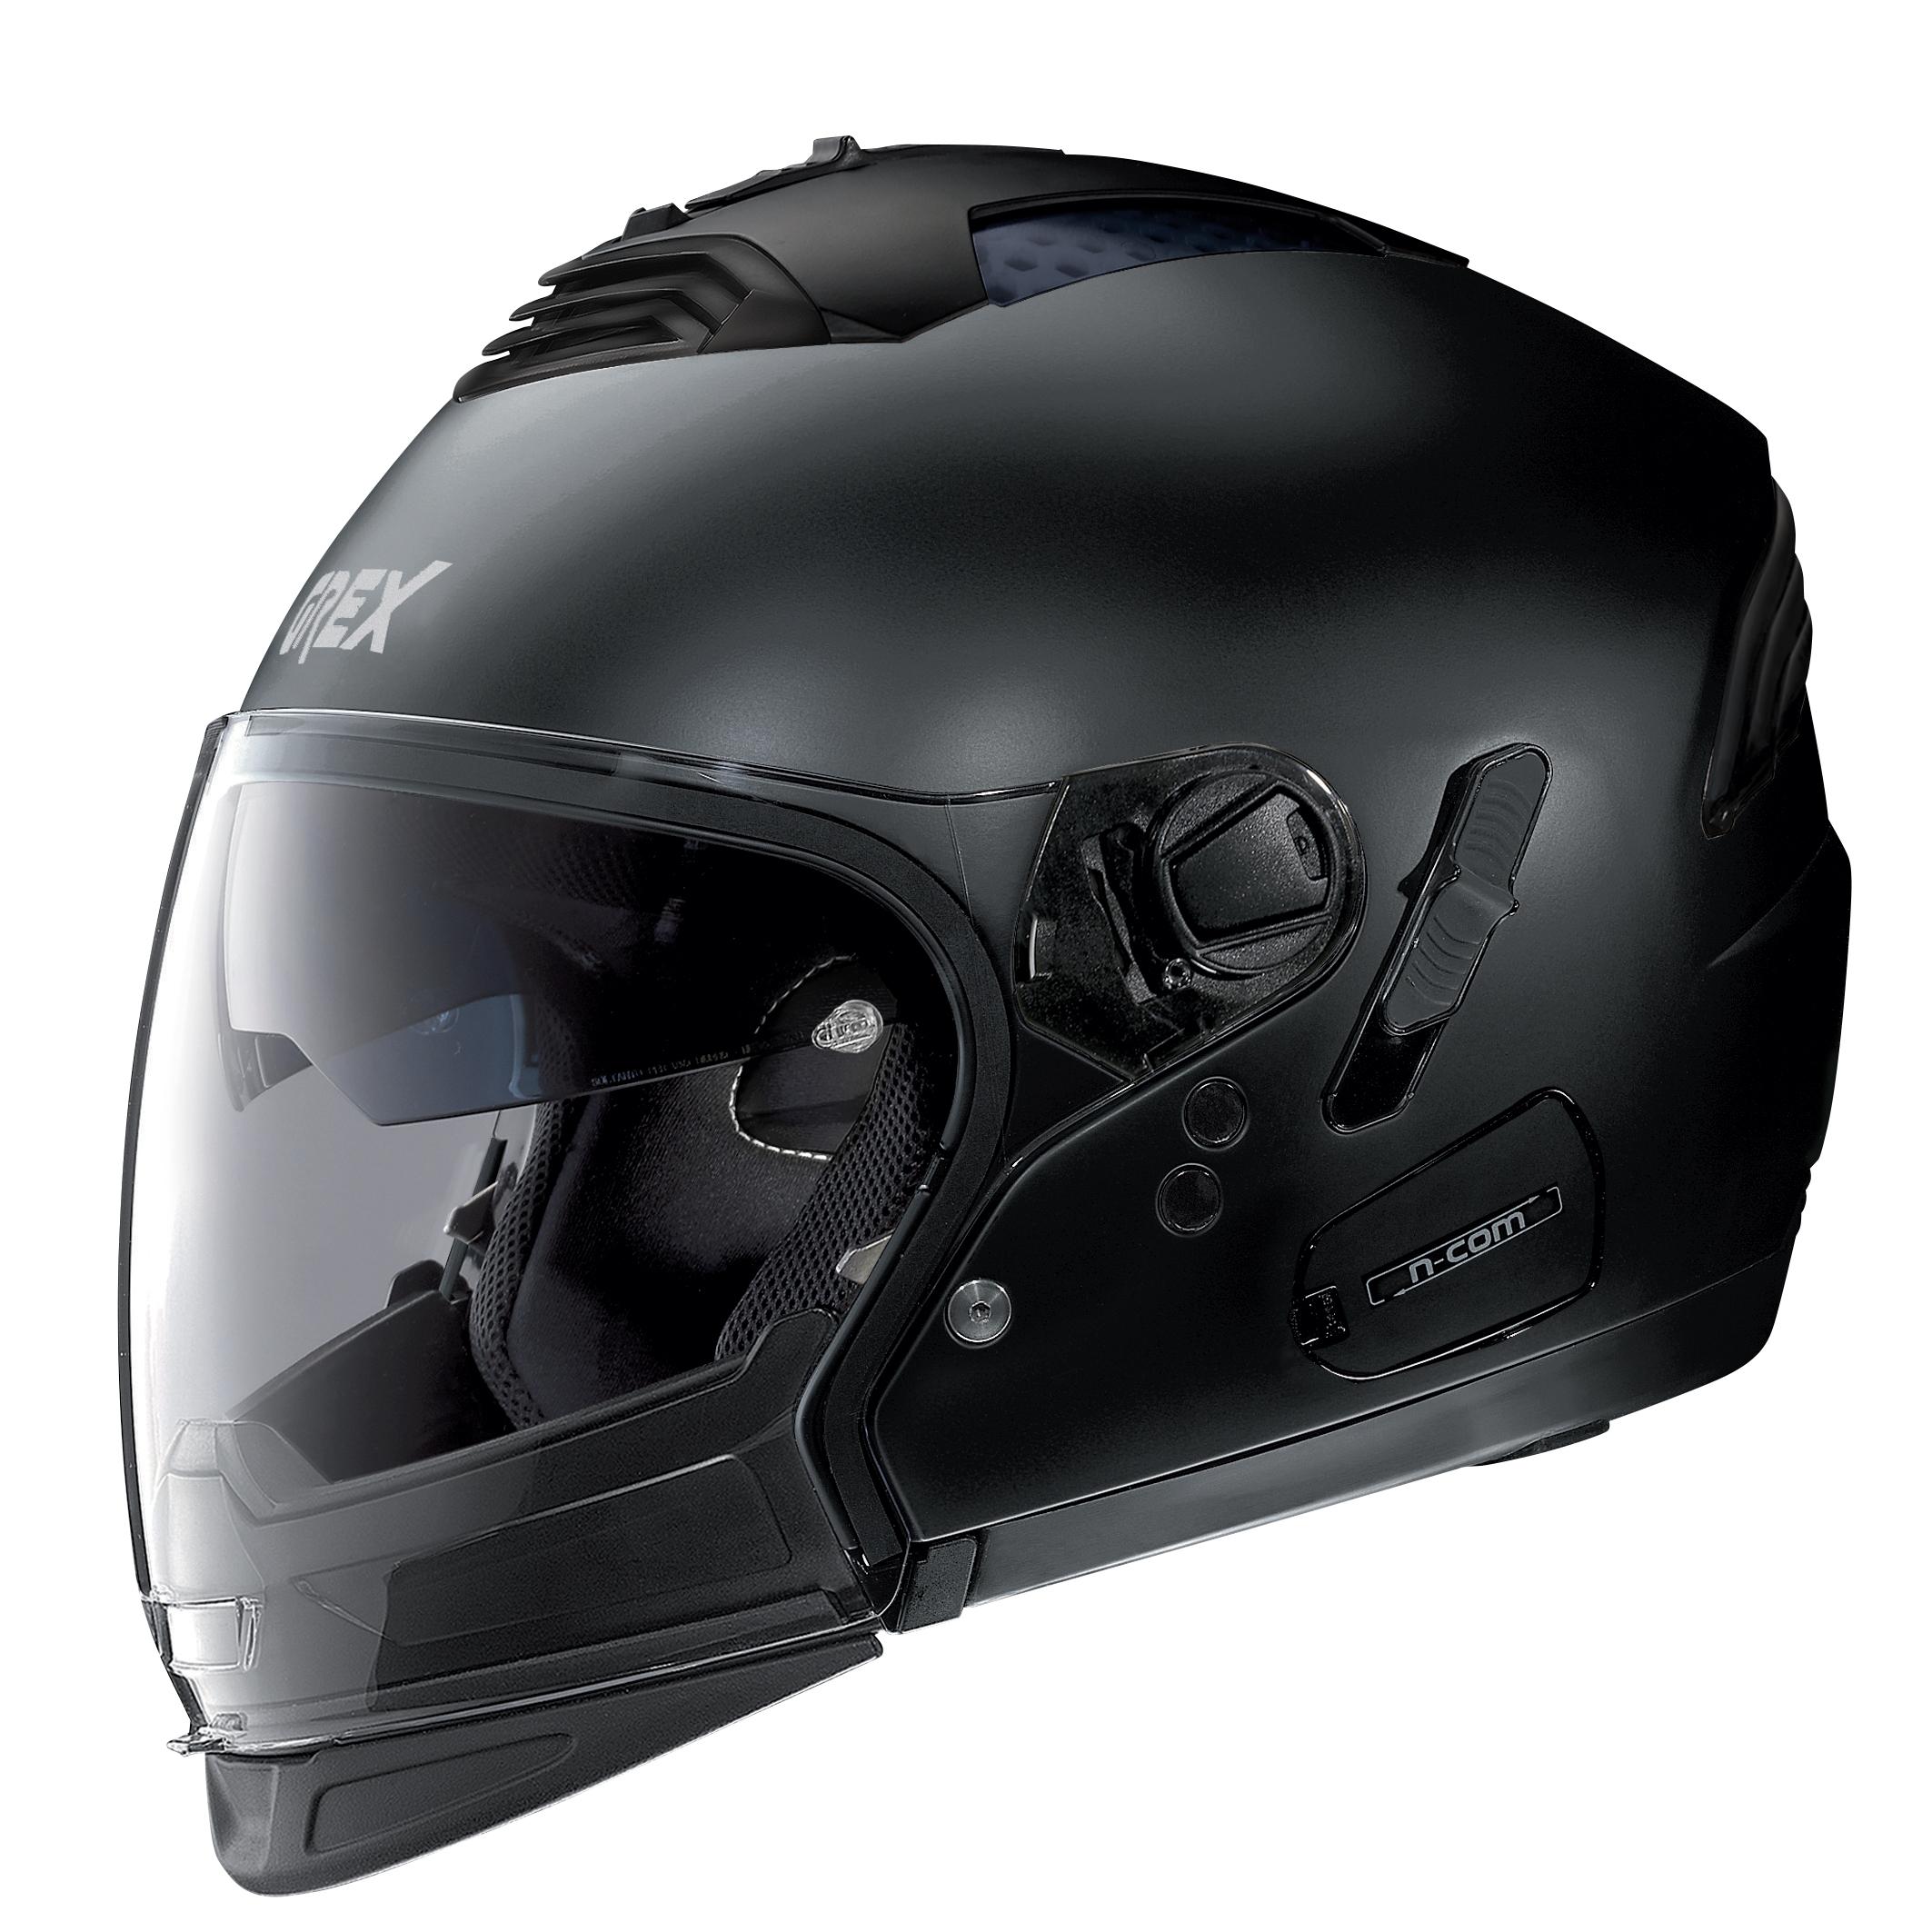 Moto helma Grex G4.2 PRO Kinetic N-Com Flat Black 22